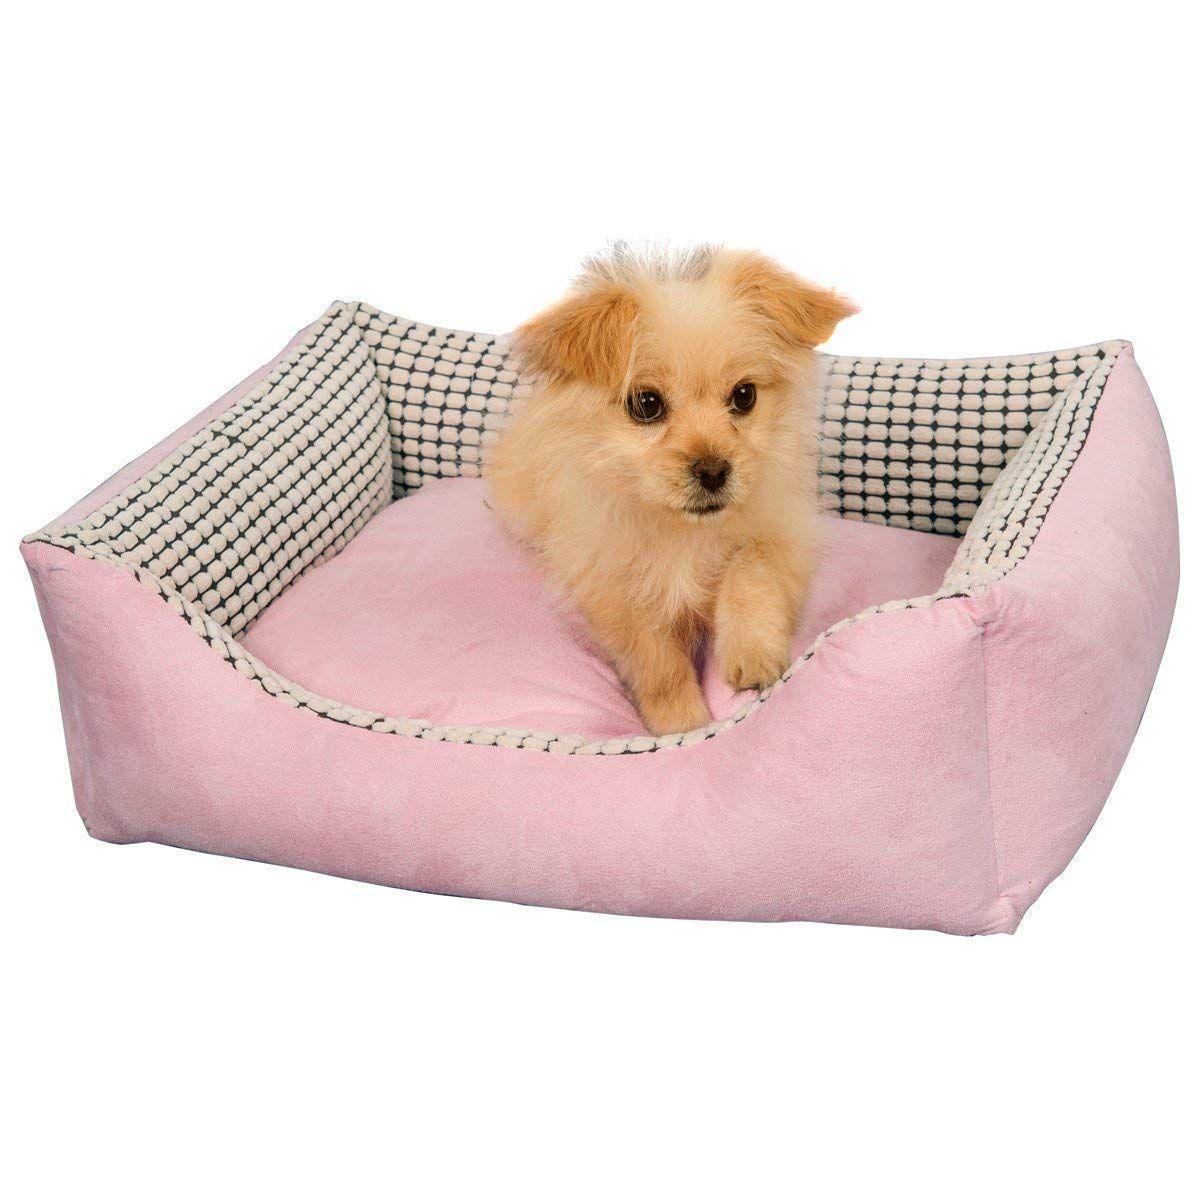 Favorite Ultra Soft Warm Pet Puppy Dog Cat Sleeping Bed